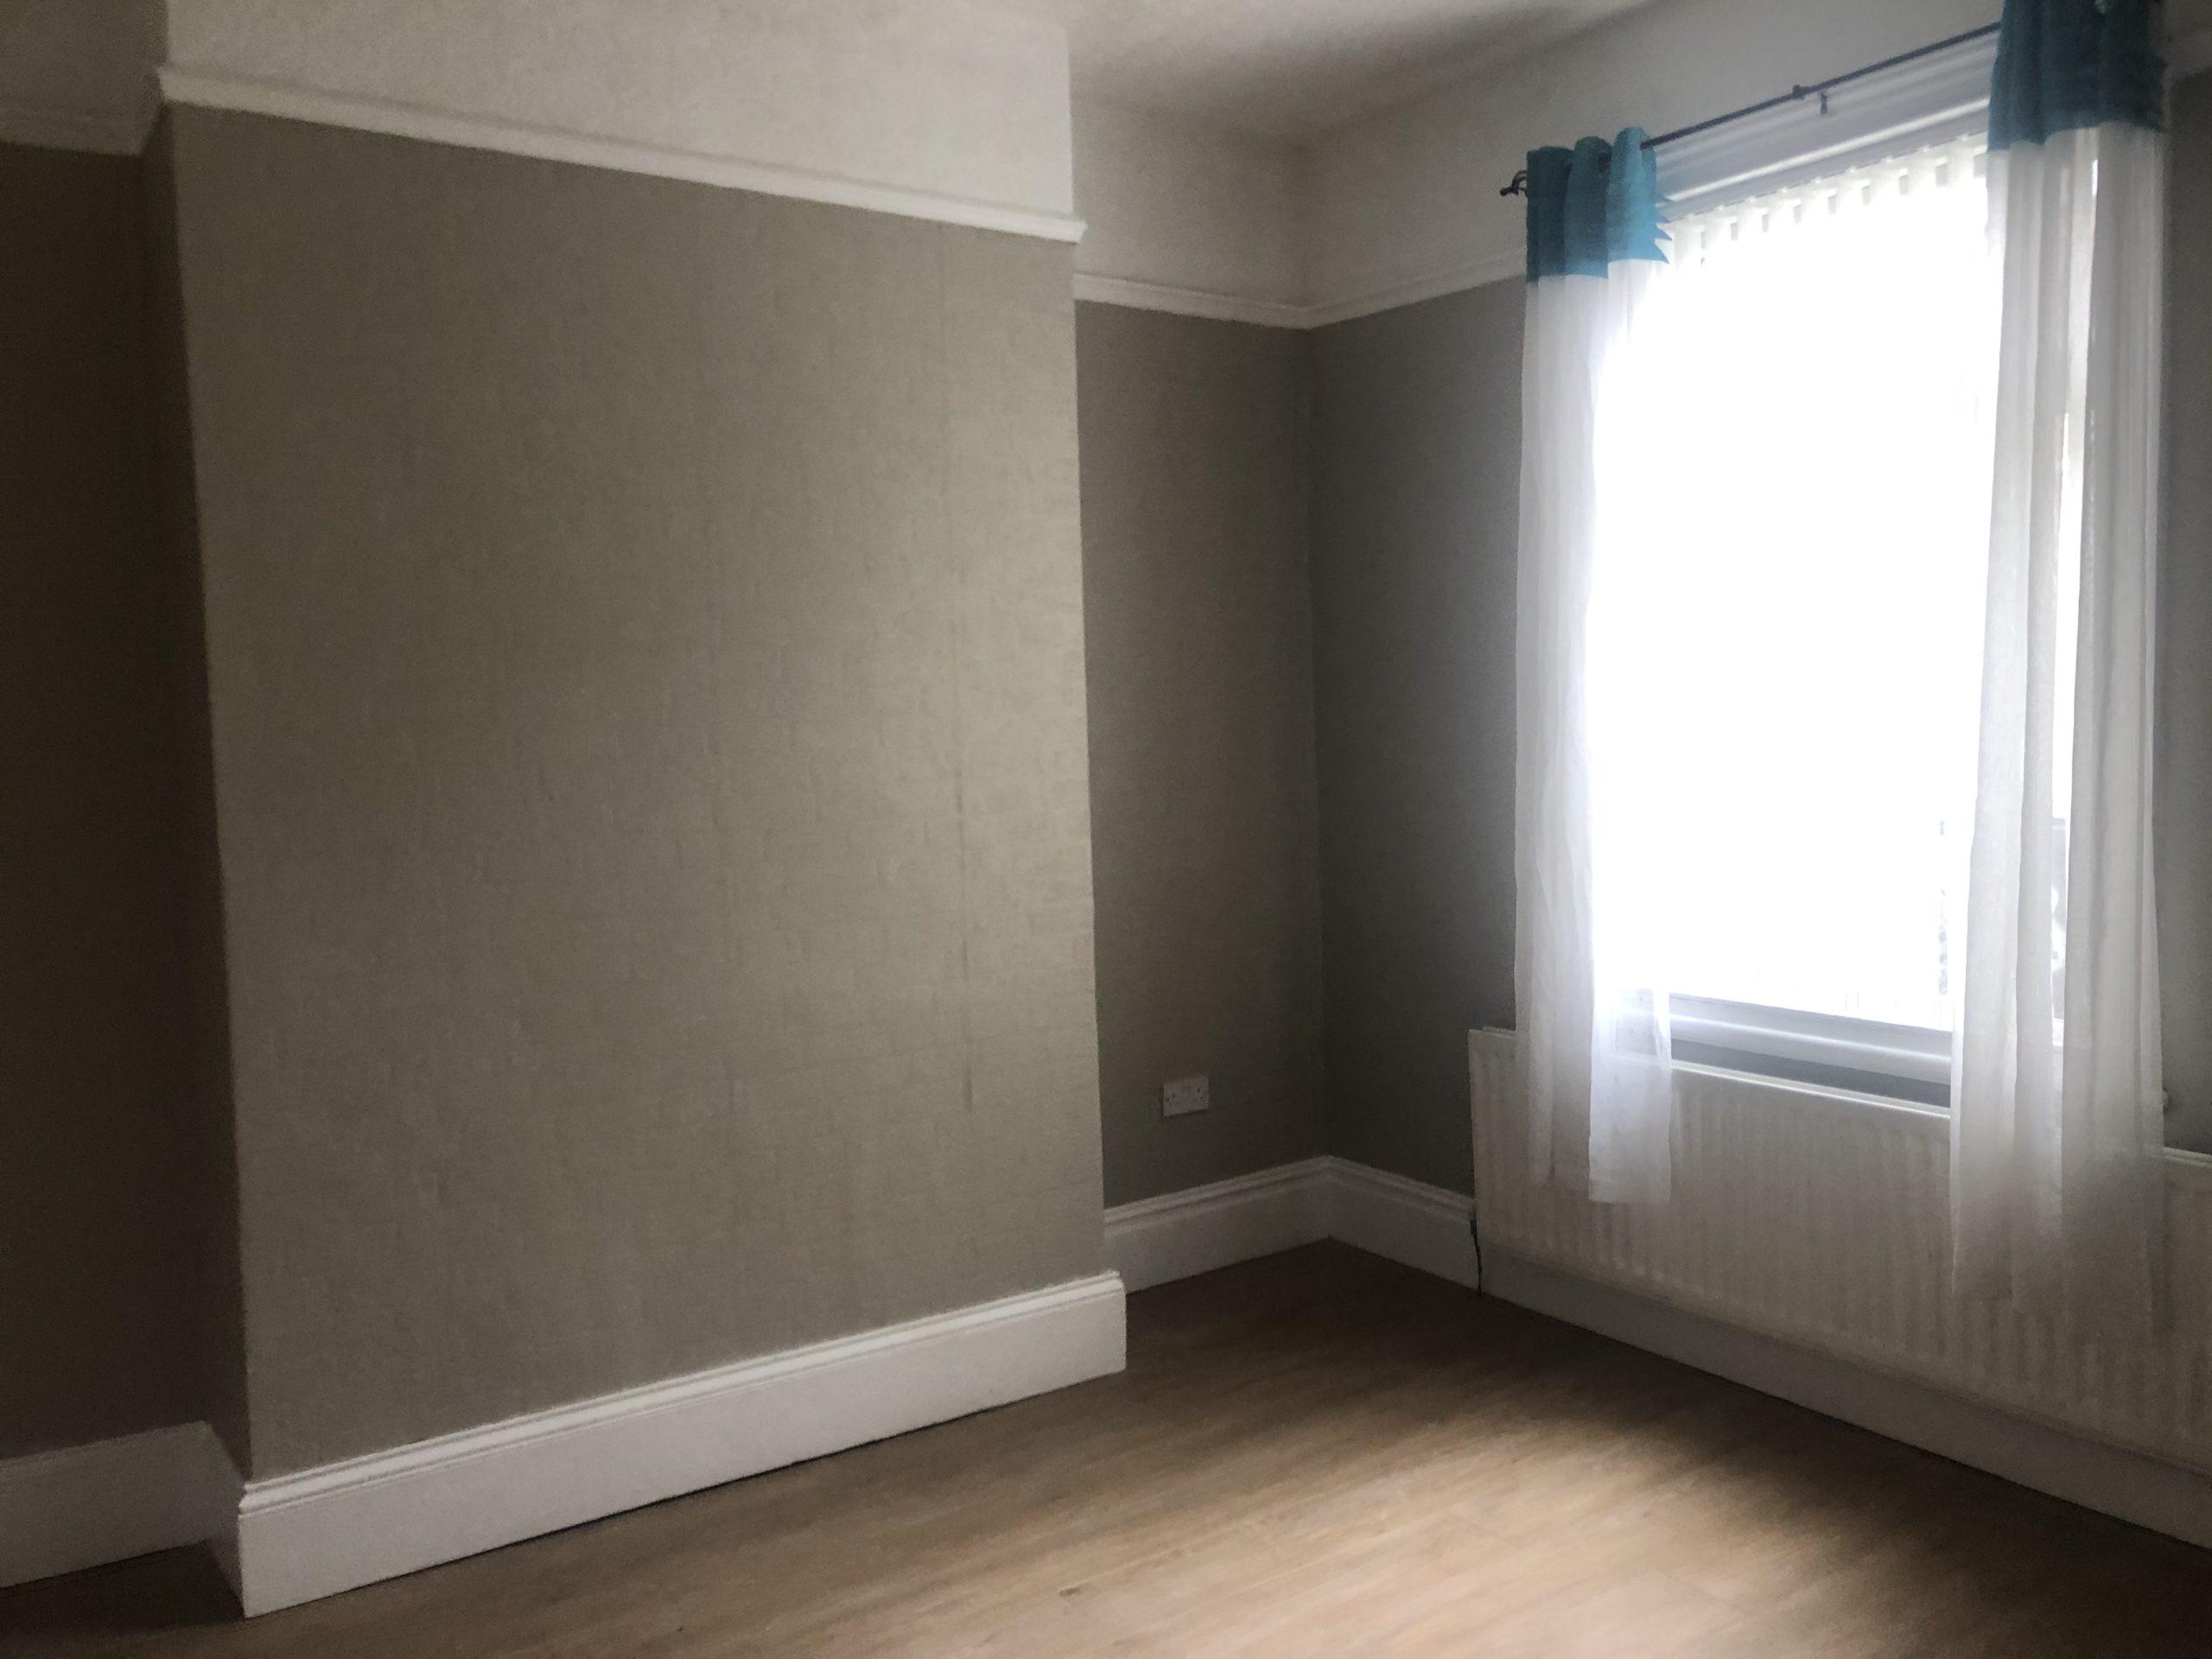 carlton street hartlepool oiro £57000  next step property